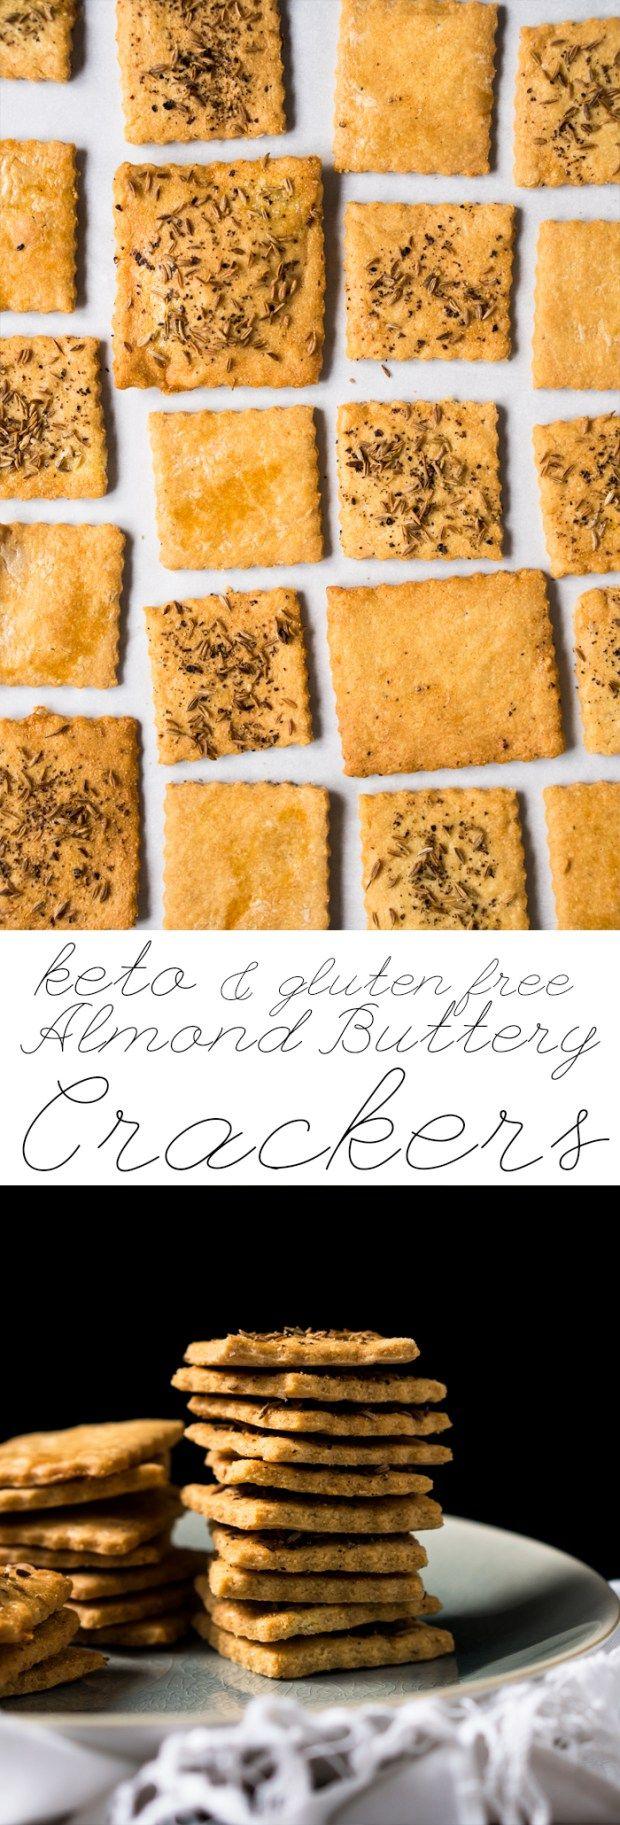 Grain Free, Gluten Free & Keto Almond Crackers  #keto #ketosnacks #ketocrackers